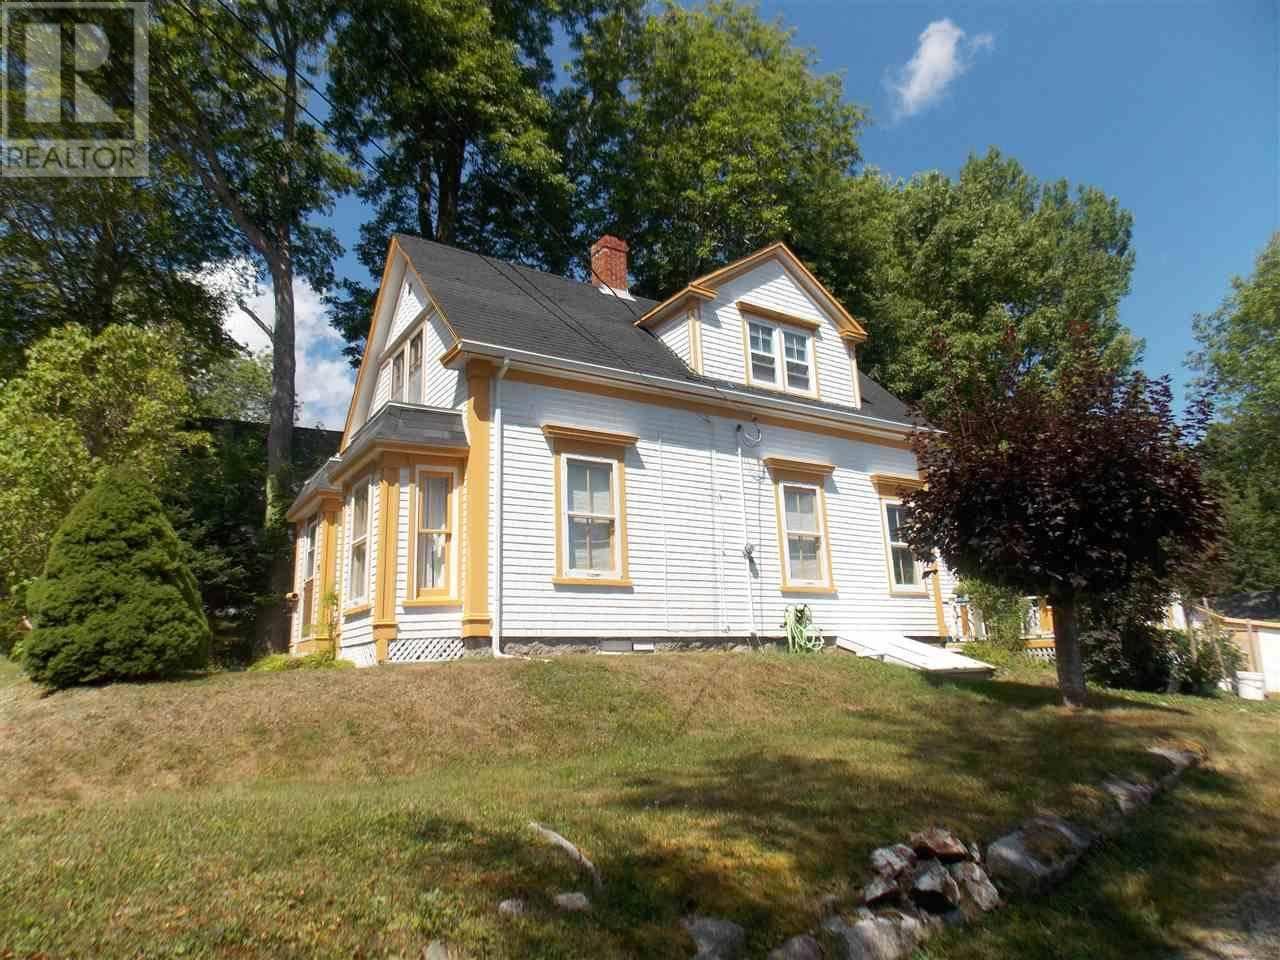 House for sale at 16 Garden Ln Mahone Bay Nova Scotia - MLS: 201920852